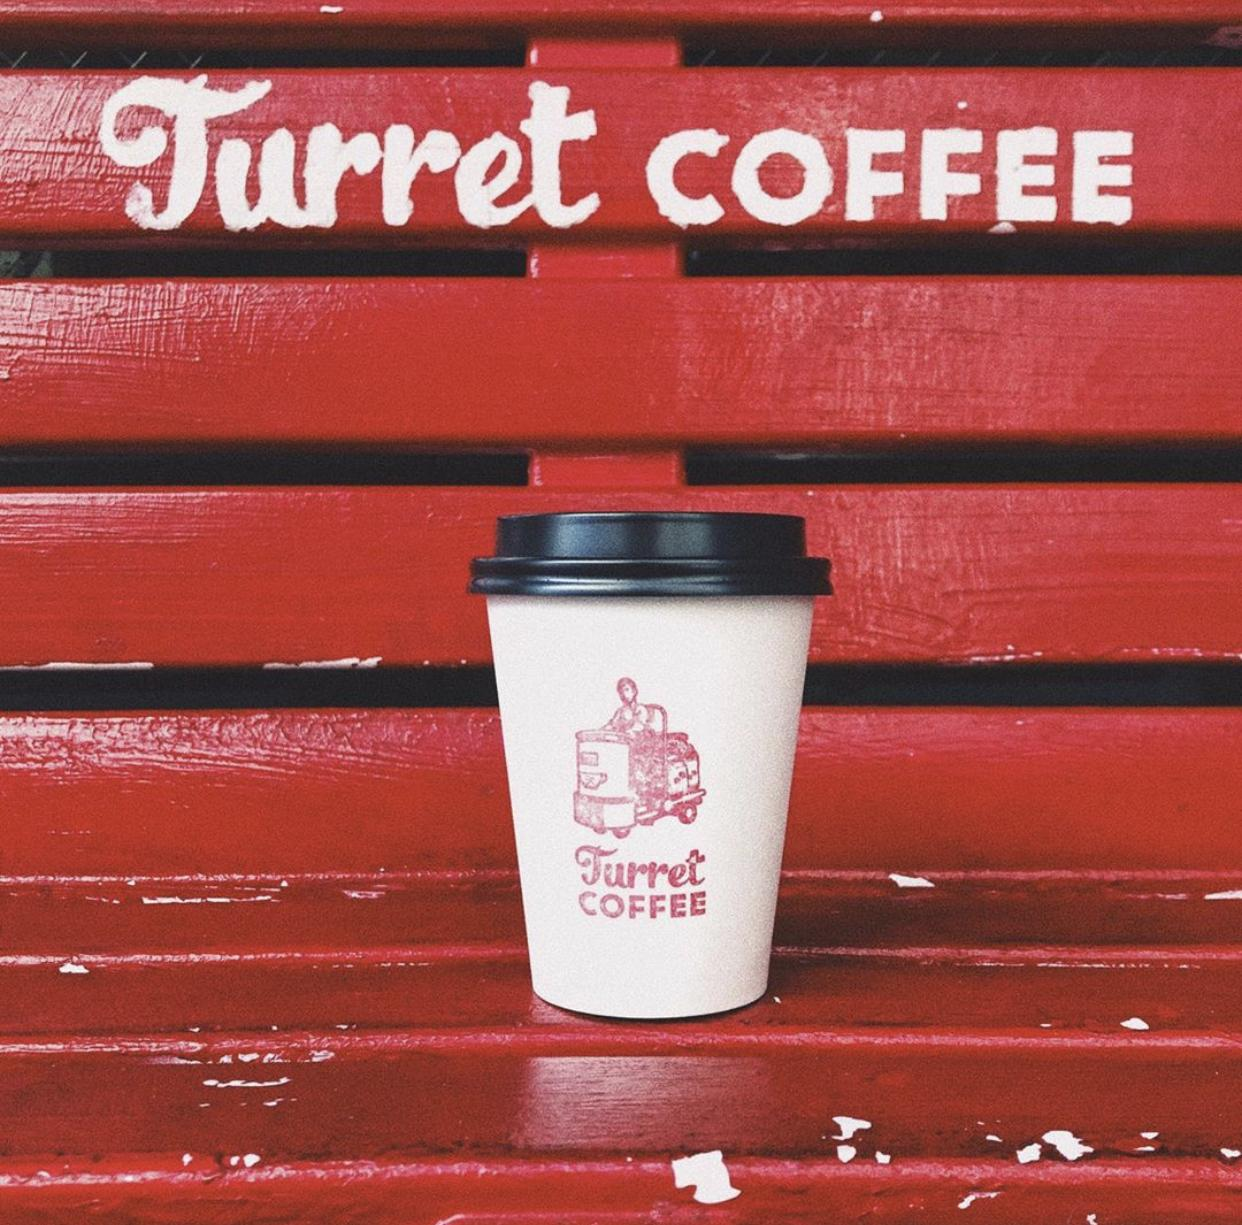 best coffee shop tokyo - Turret Coffee